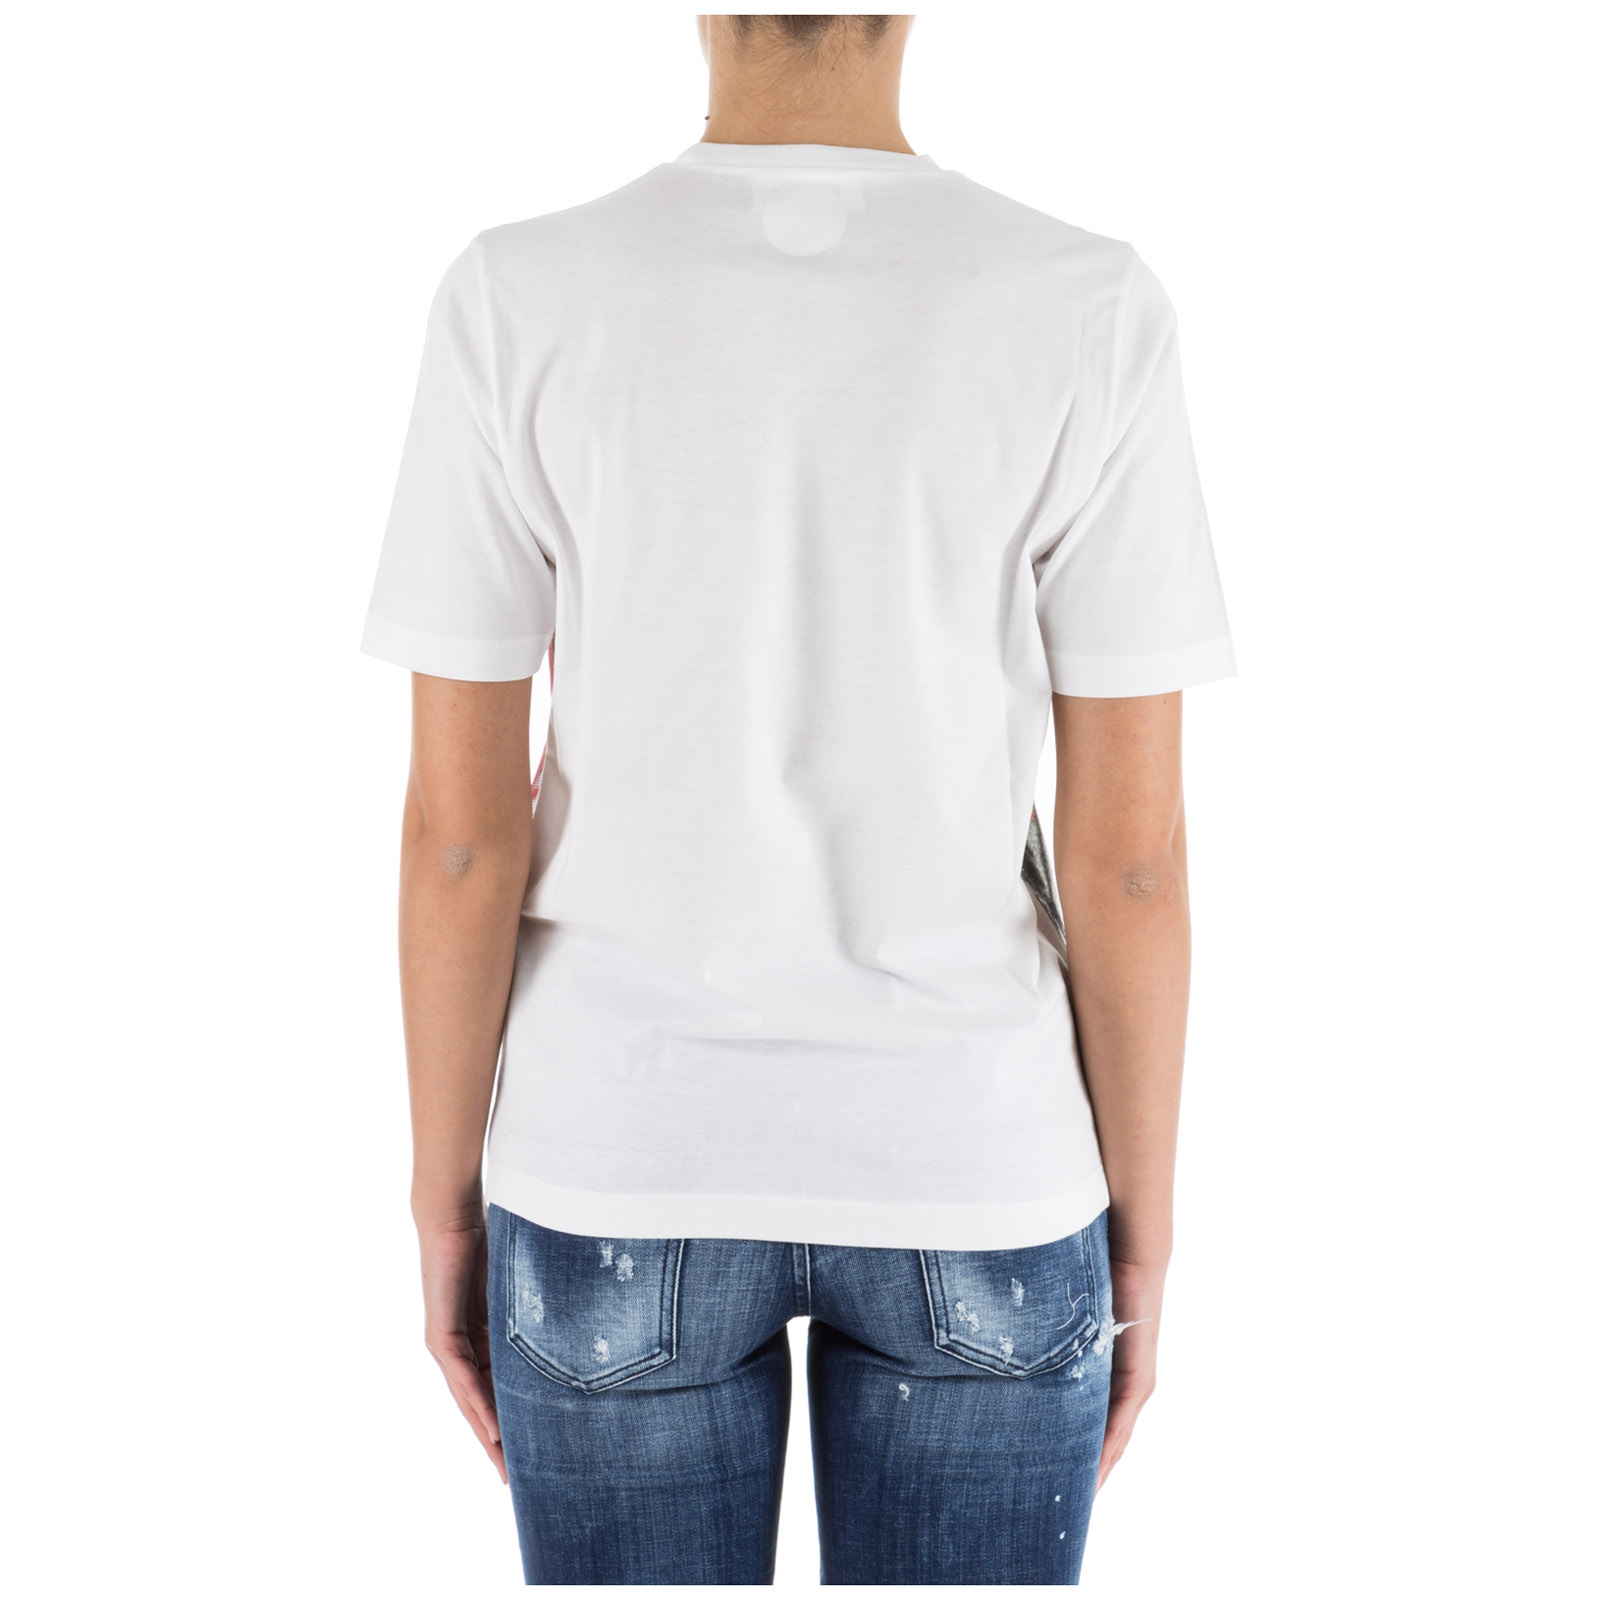 Women's t-shirt short sleeve crew neck round